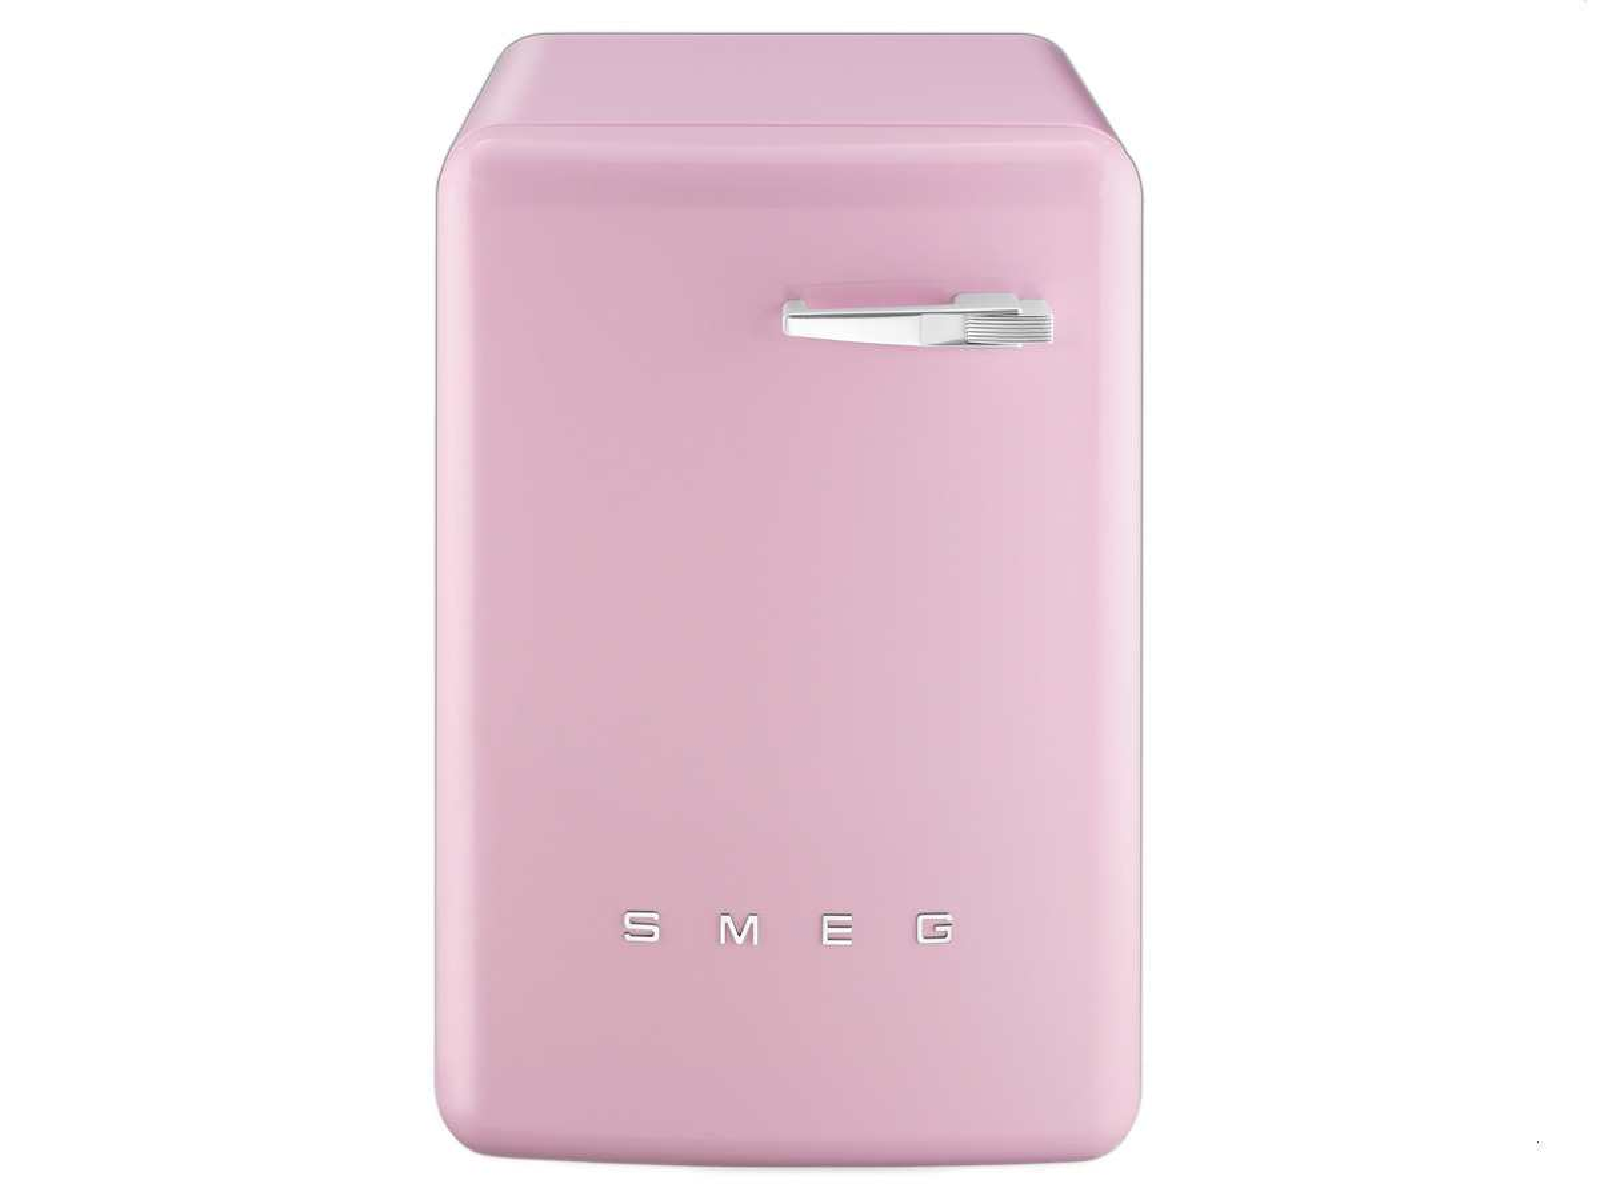 smeg lbb14ro stand waschmaschine cadillac pink auqa stop mengenautomatik 7kg a ebay. Black Bedroom Furniture Sets. Home Design Ideas